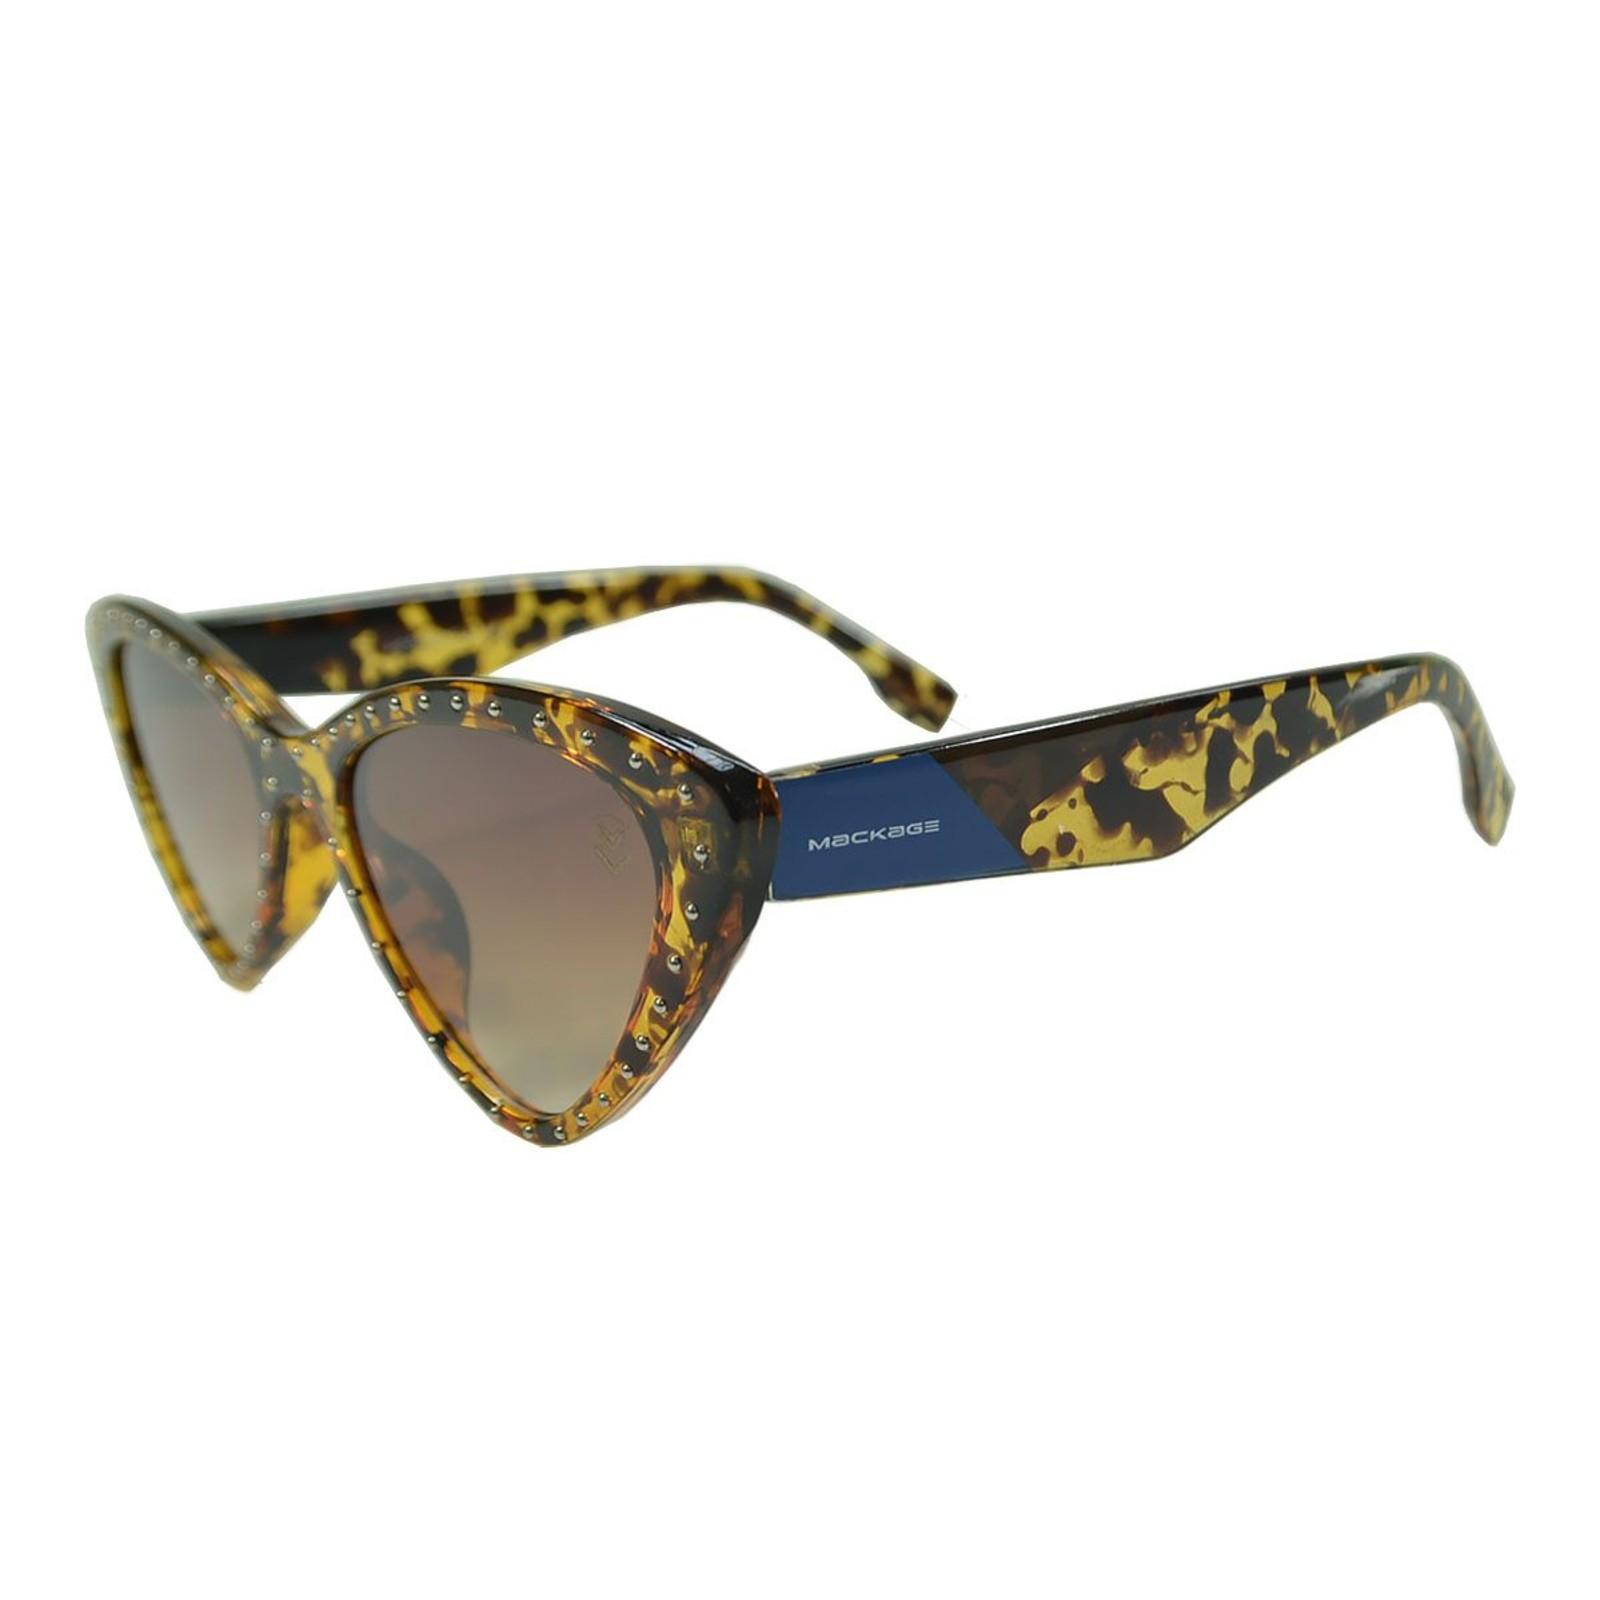 Óculos De Sol Mackage Feminino Acetato Gatinho Retrô - Tartaruga